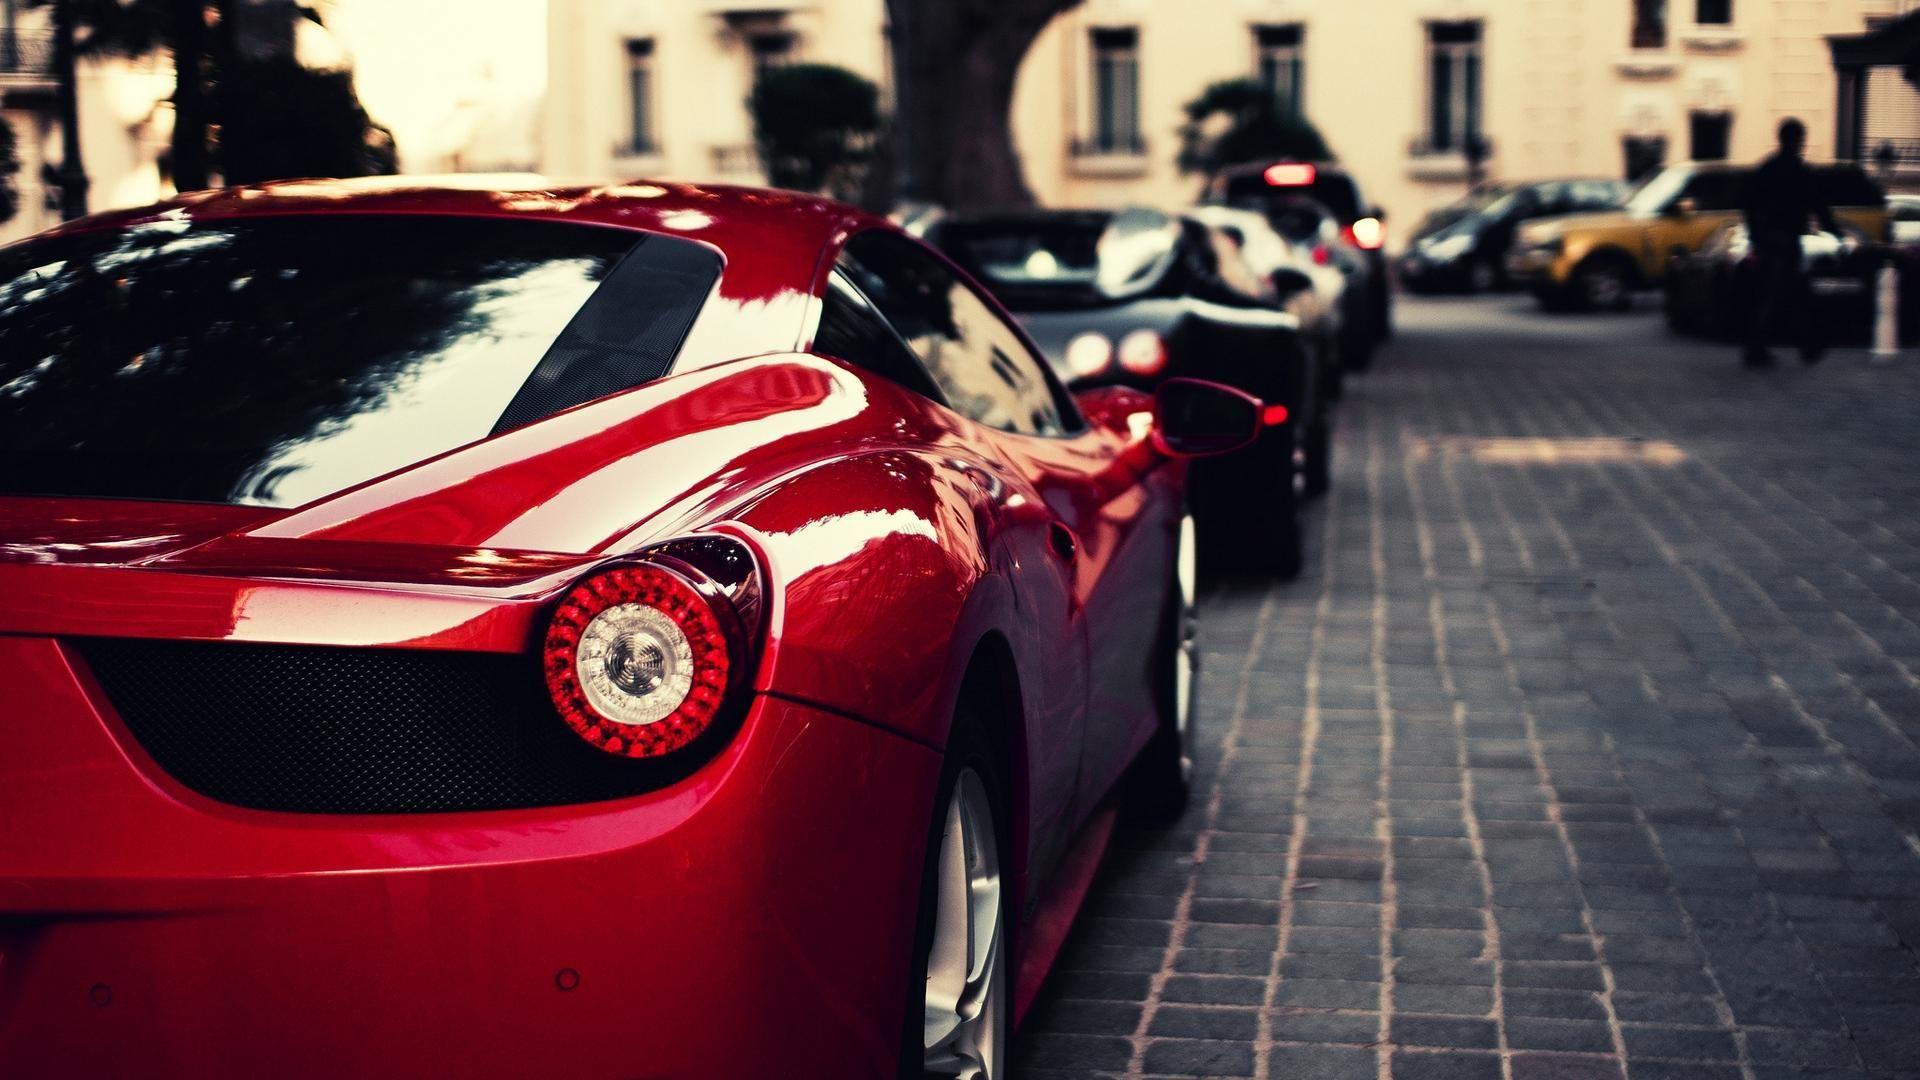 Ferrari Car Hd Wallpapers 1080p 330273 Sports Cars Luxury Ferrari Car Sports Car